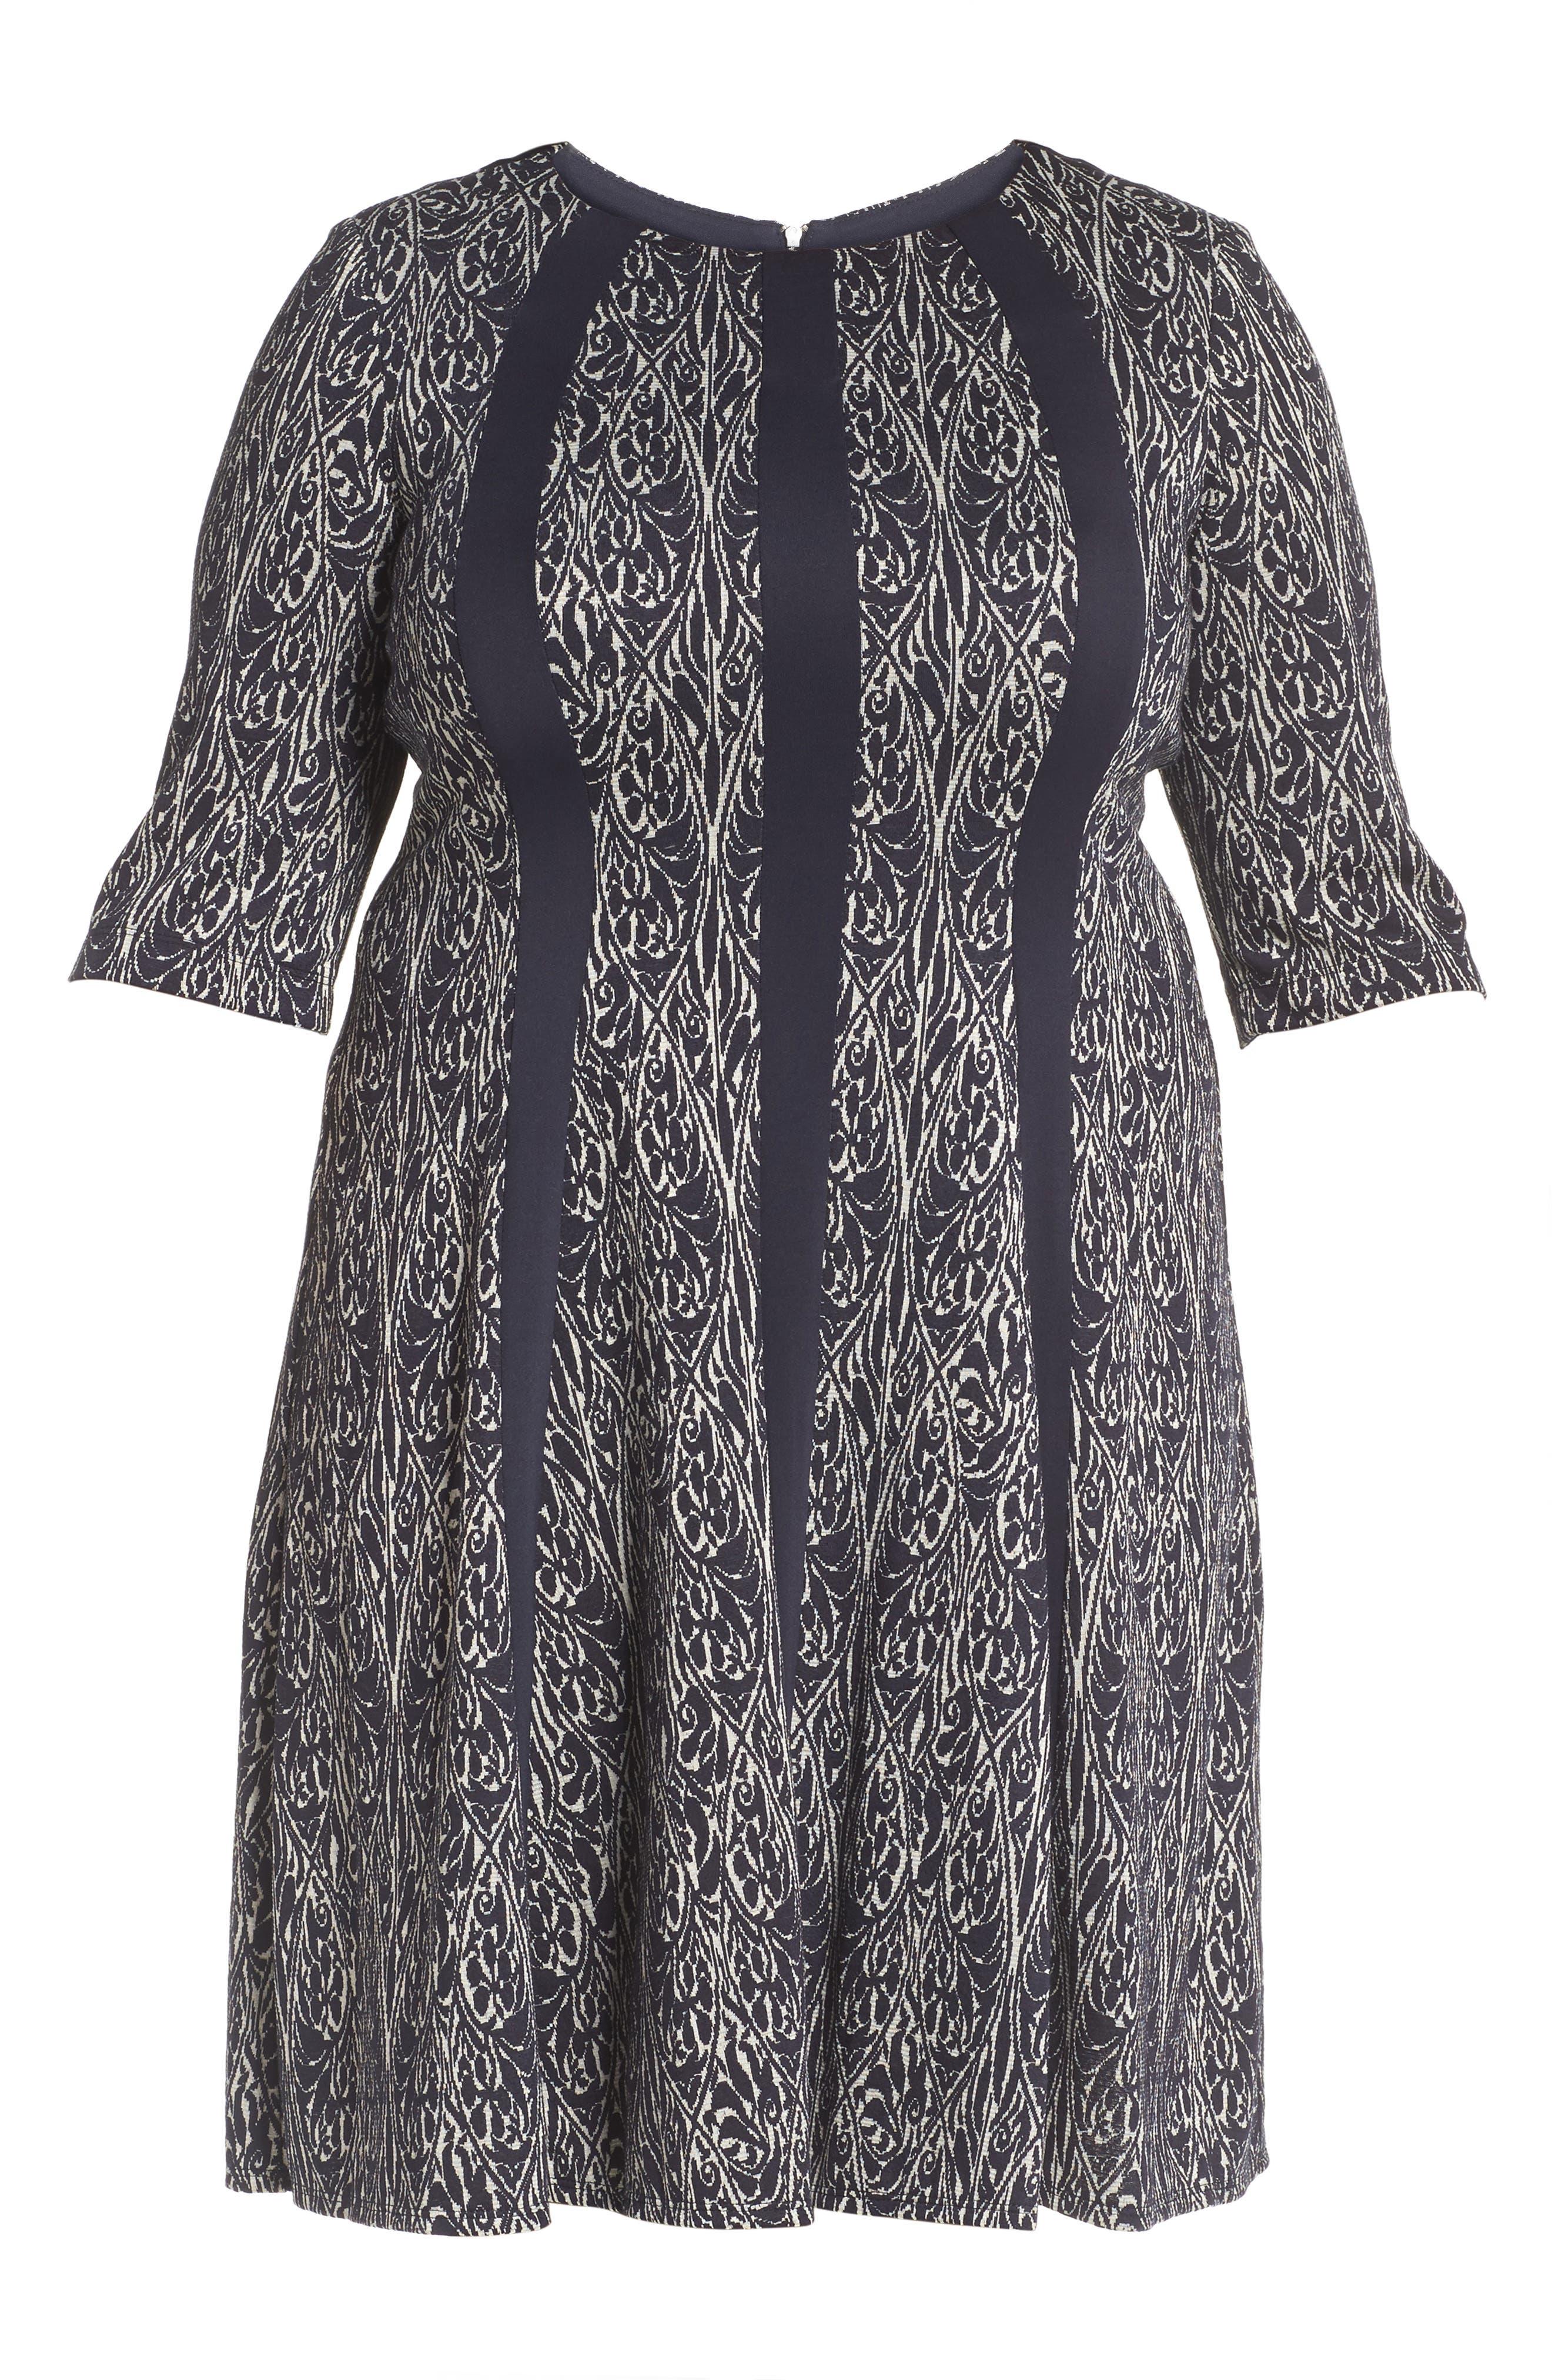 Jacquard Knit A-Line Dress,                             Alternate thumbnail 6, color,                             Navy/ Ivory